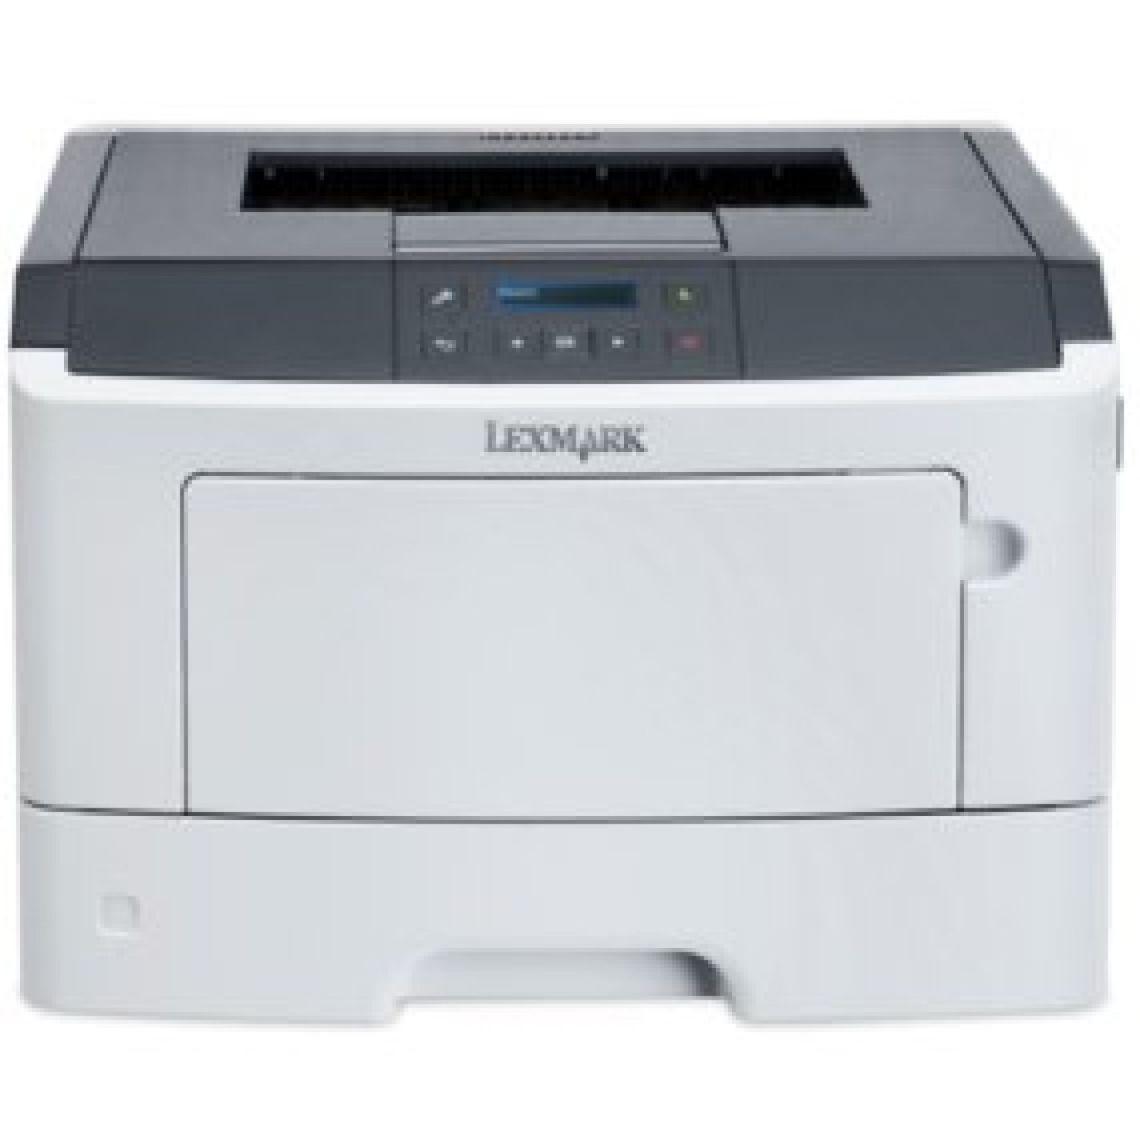 Amazon.com: Lexmark MS312dn Compact Laser Printer, Monochrome, Networking, Duplex Printing: Electronics